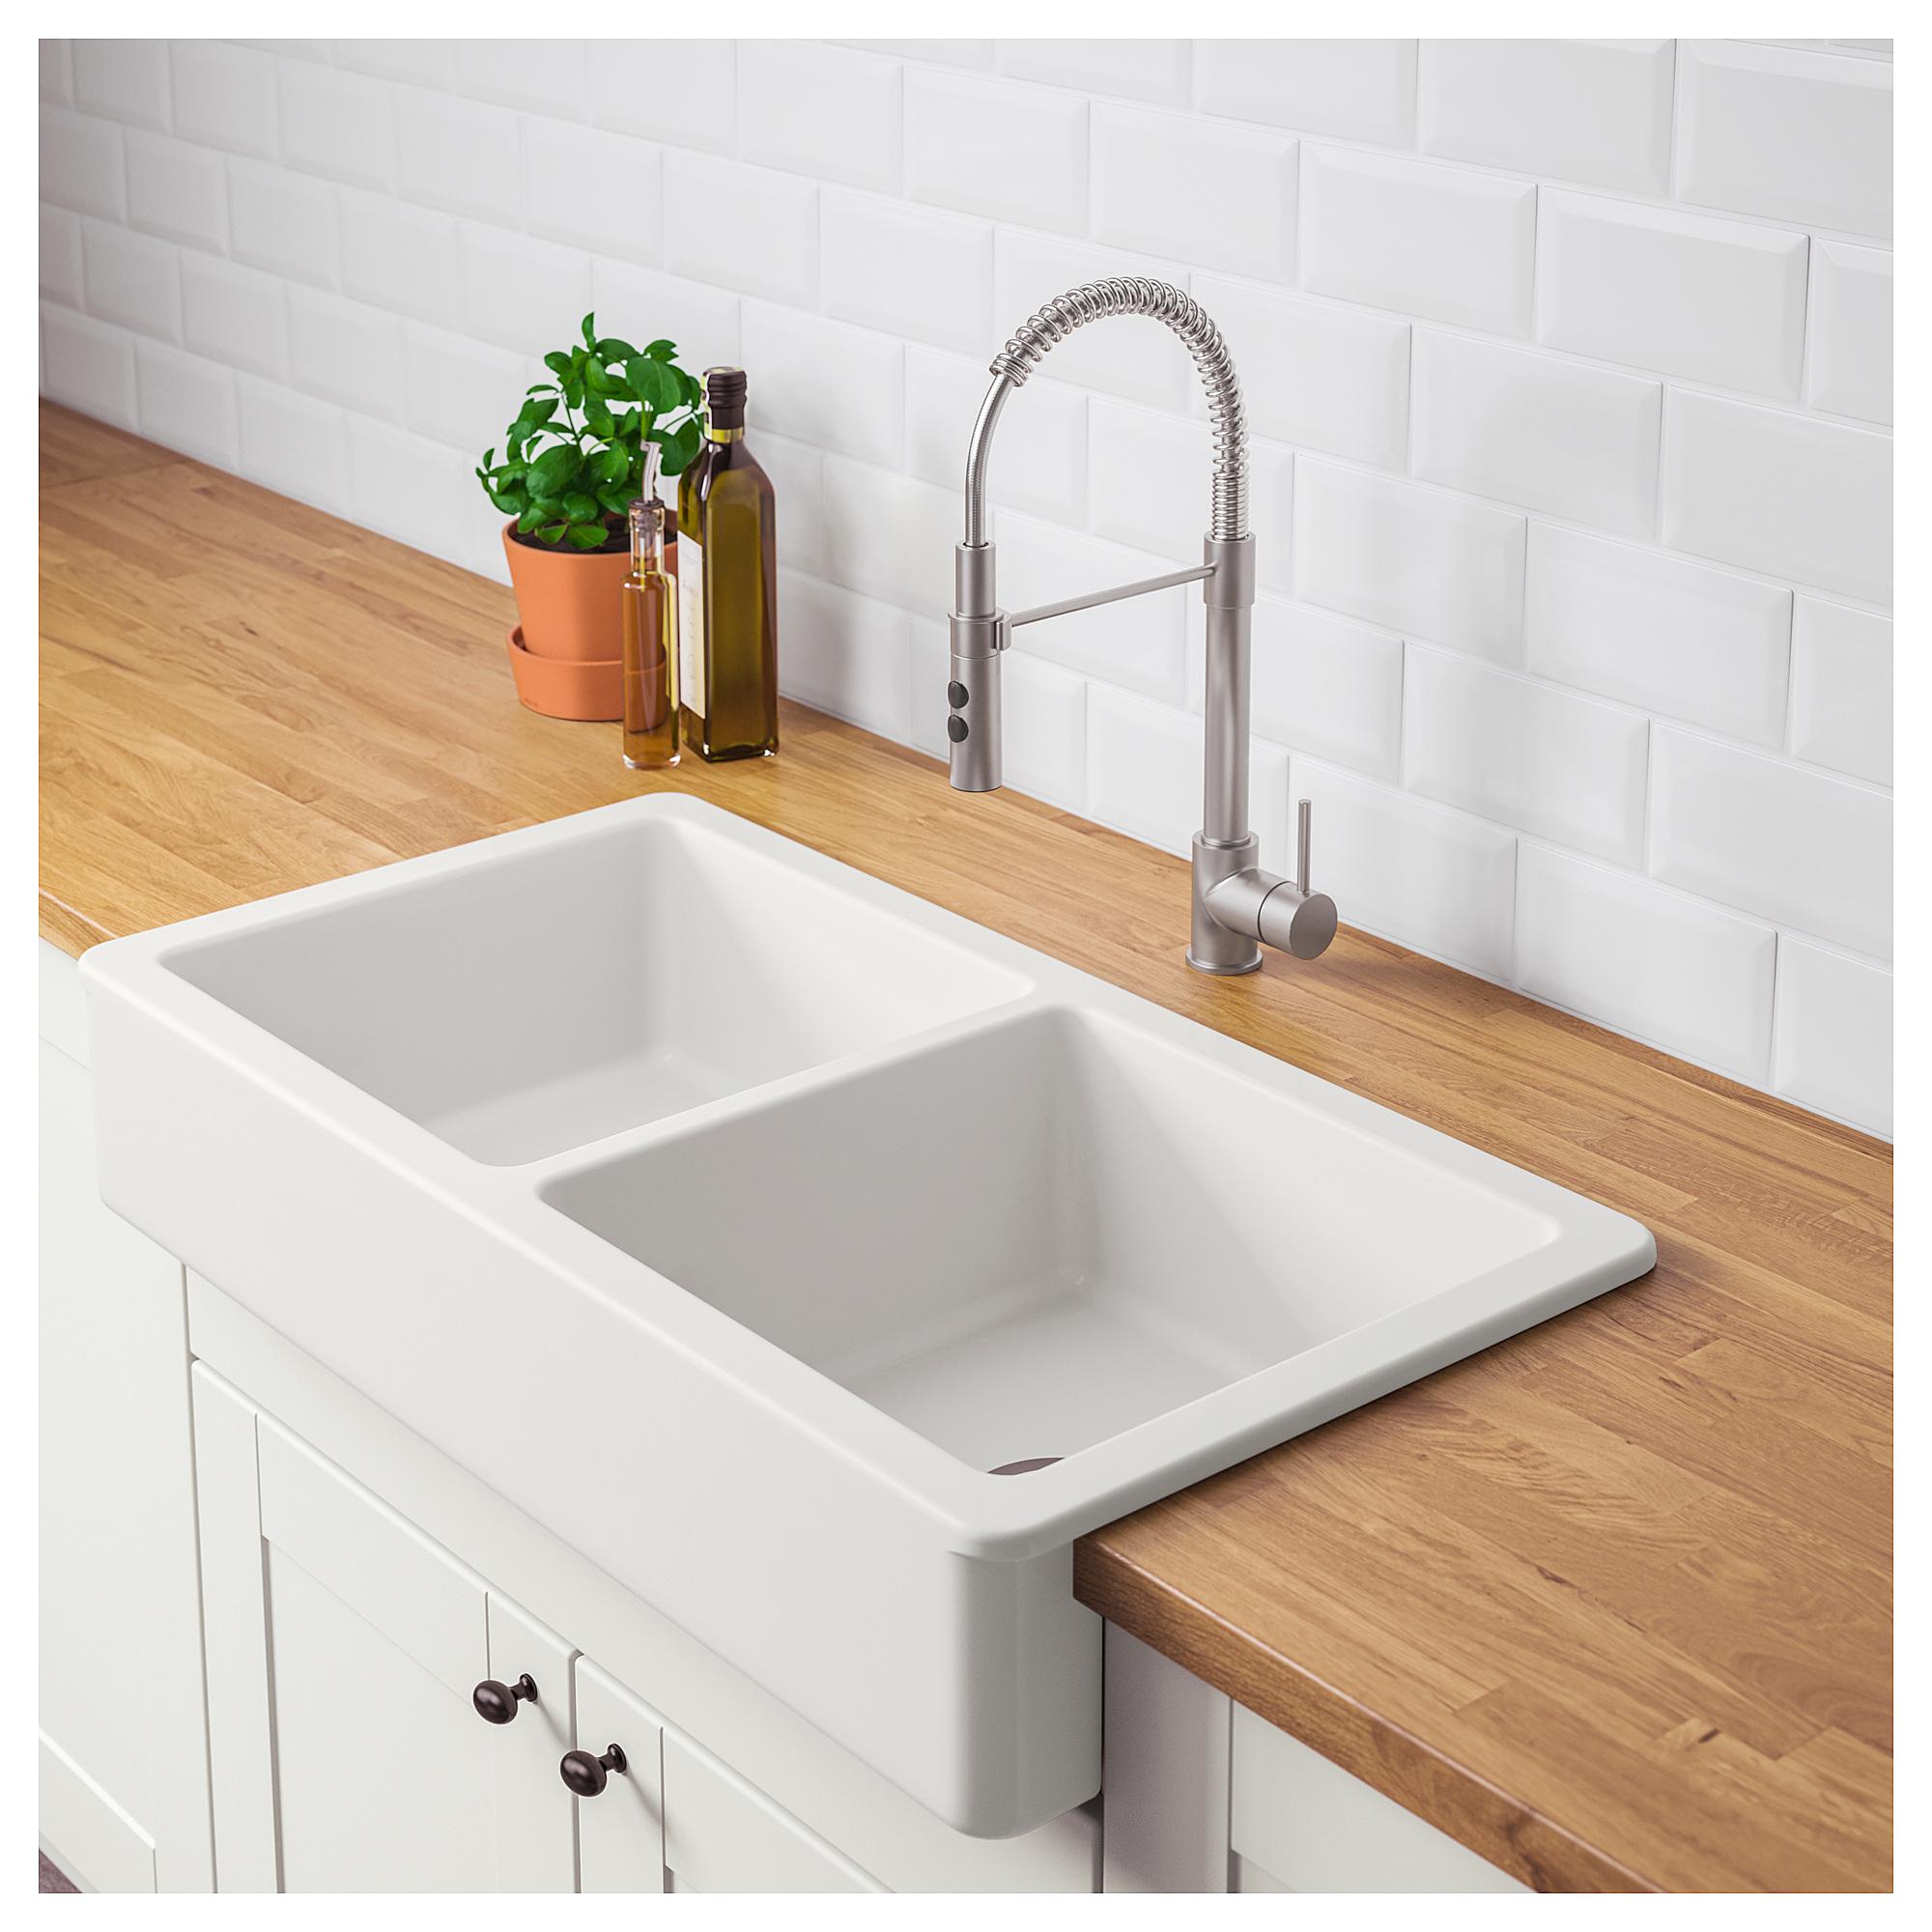 Havsen Apron Front Double Bowl Sink Ikea Double Bowl Sink